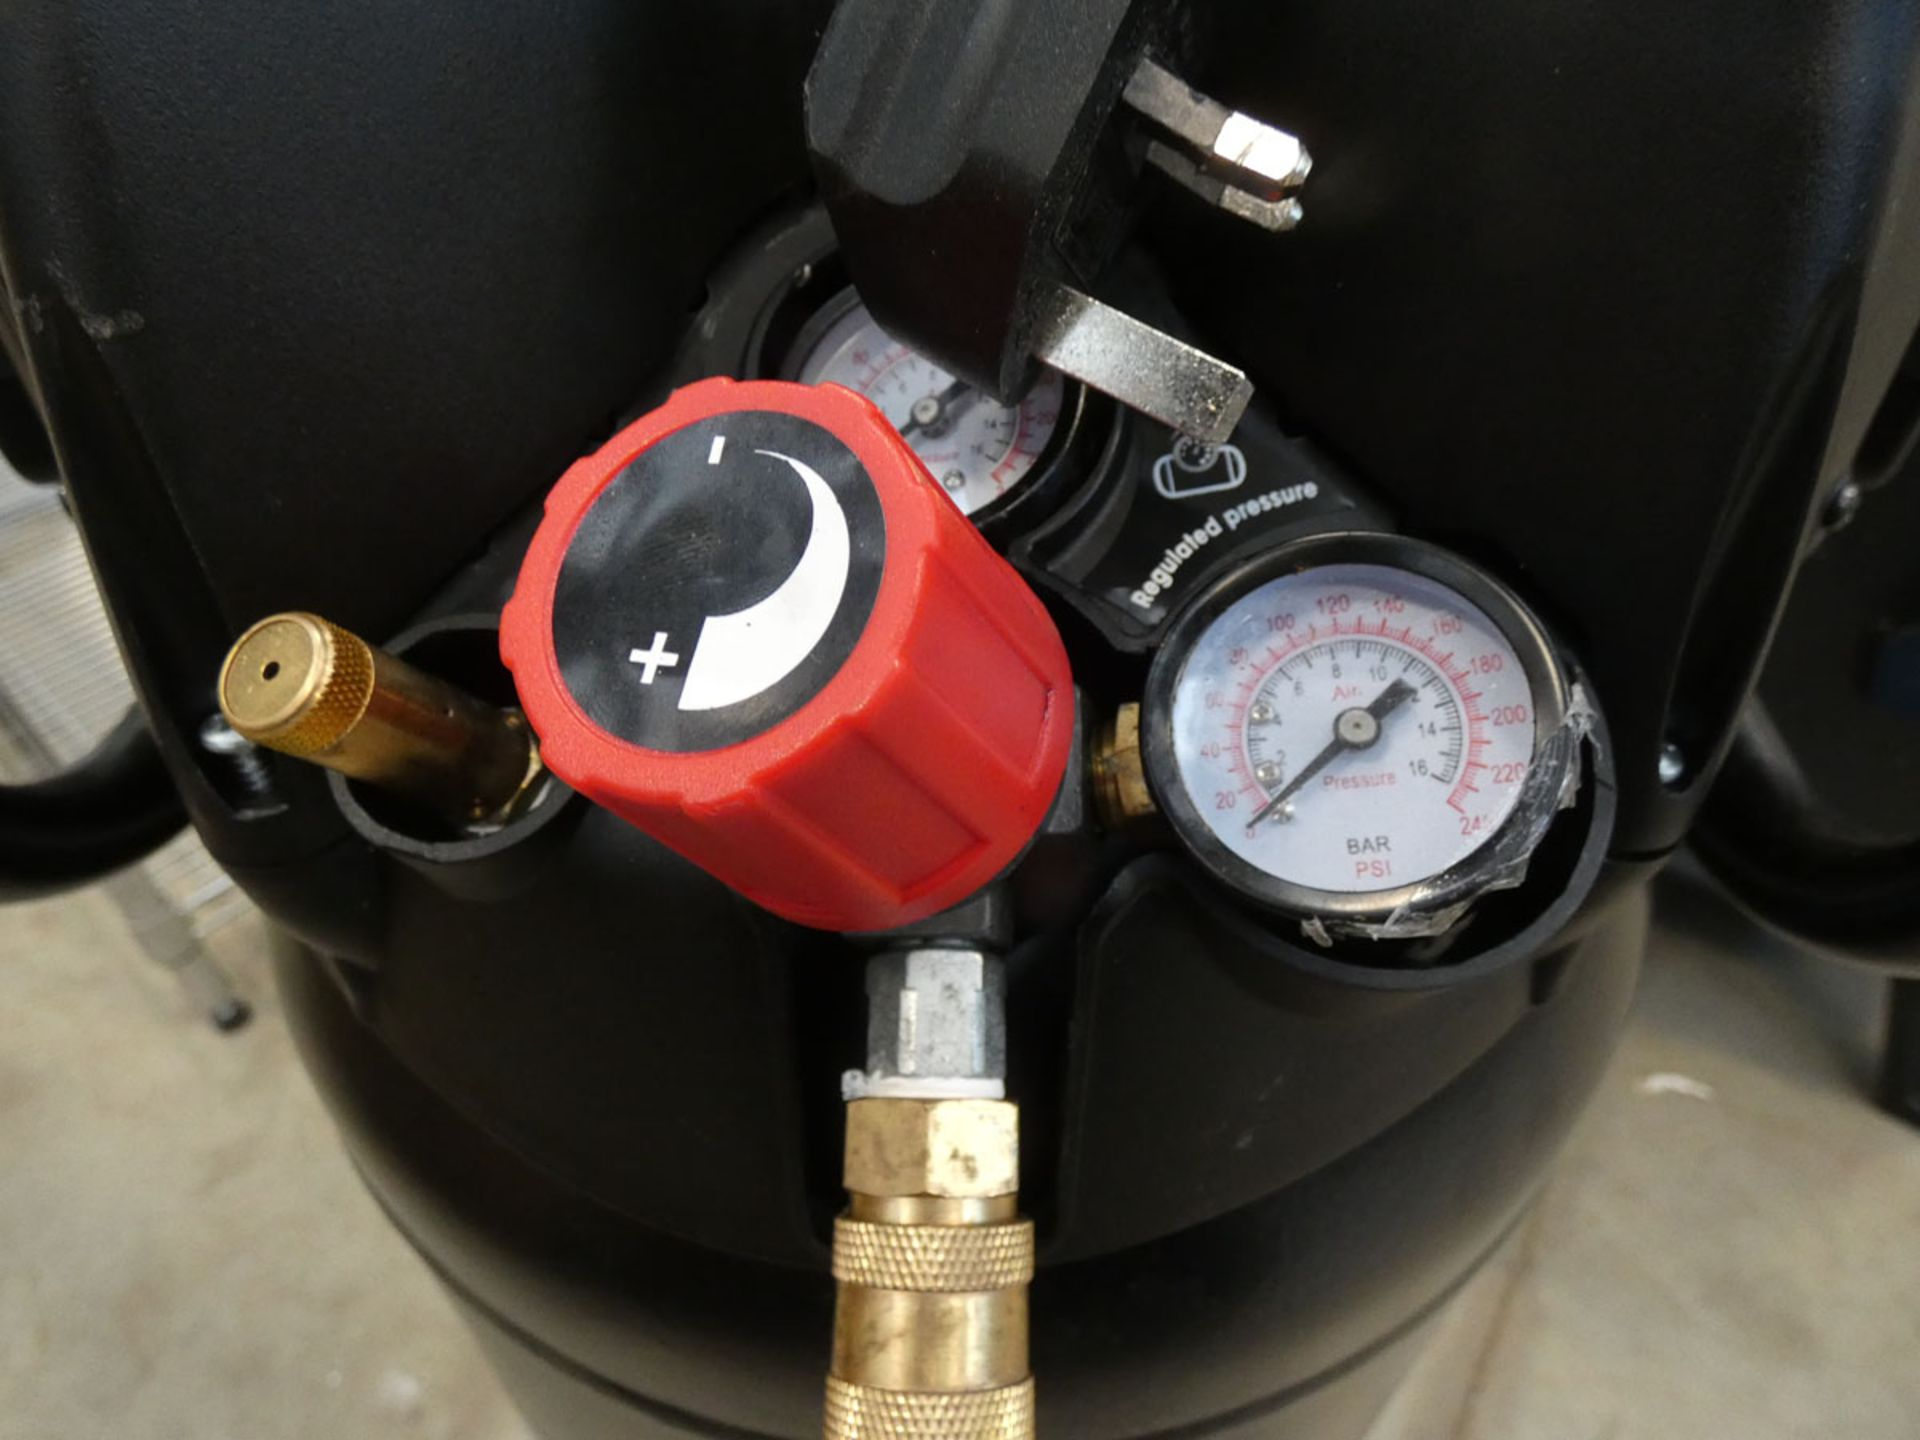 SIP 2.0hp upright compressor - Image 3 of 4